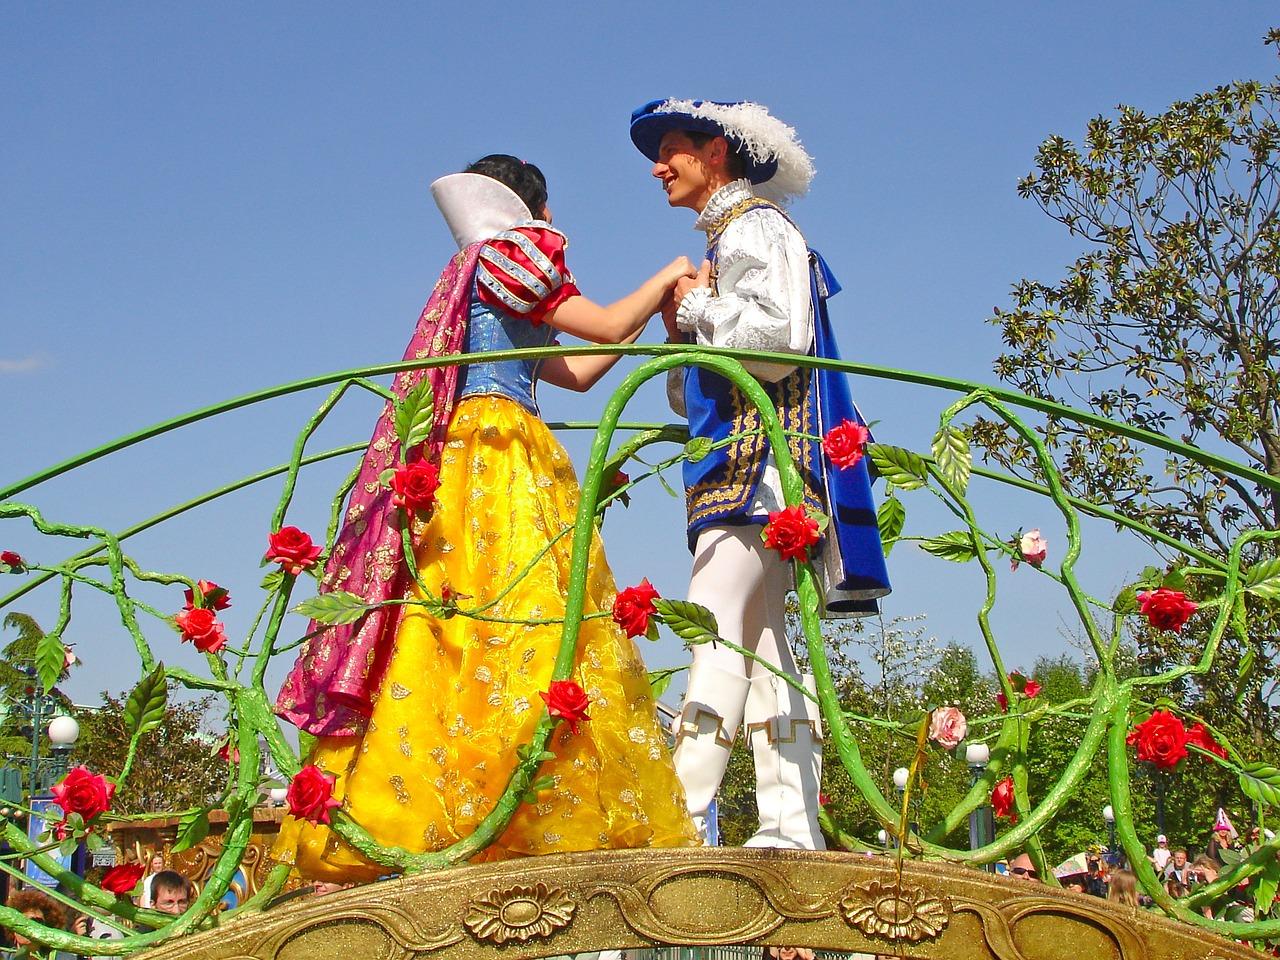 Arranging an Enchanting Disney-Themed Wedding